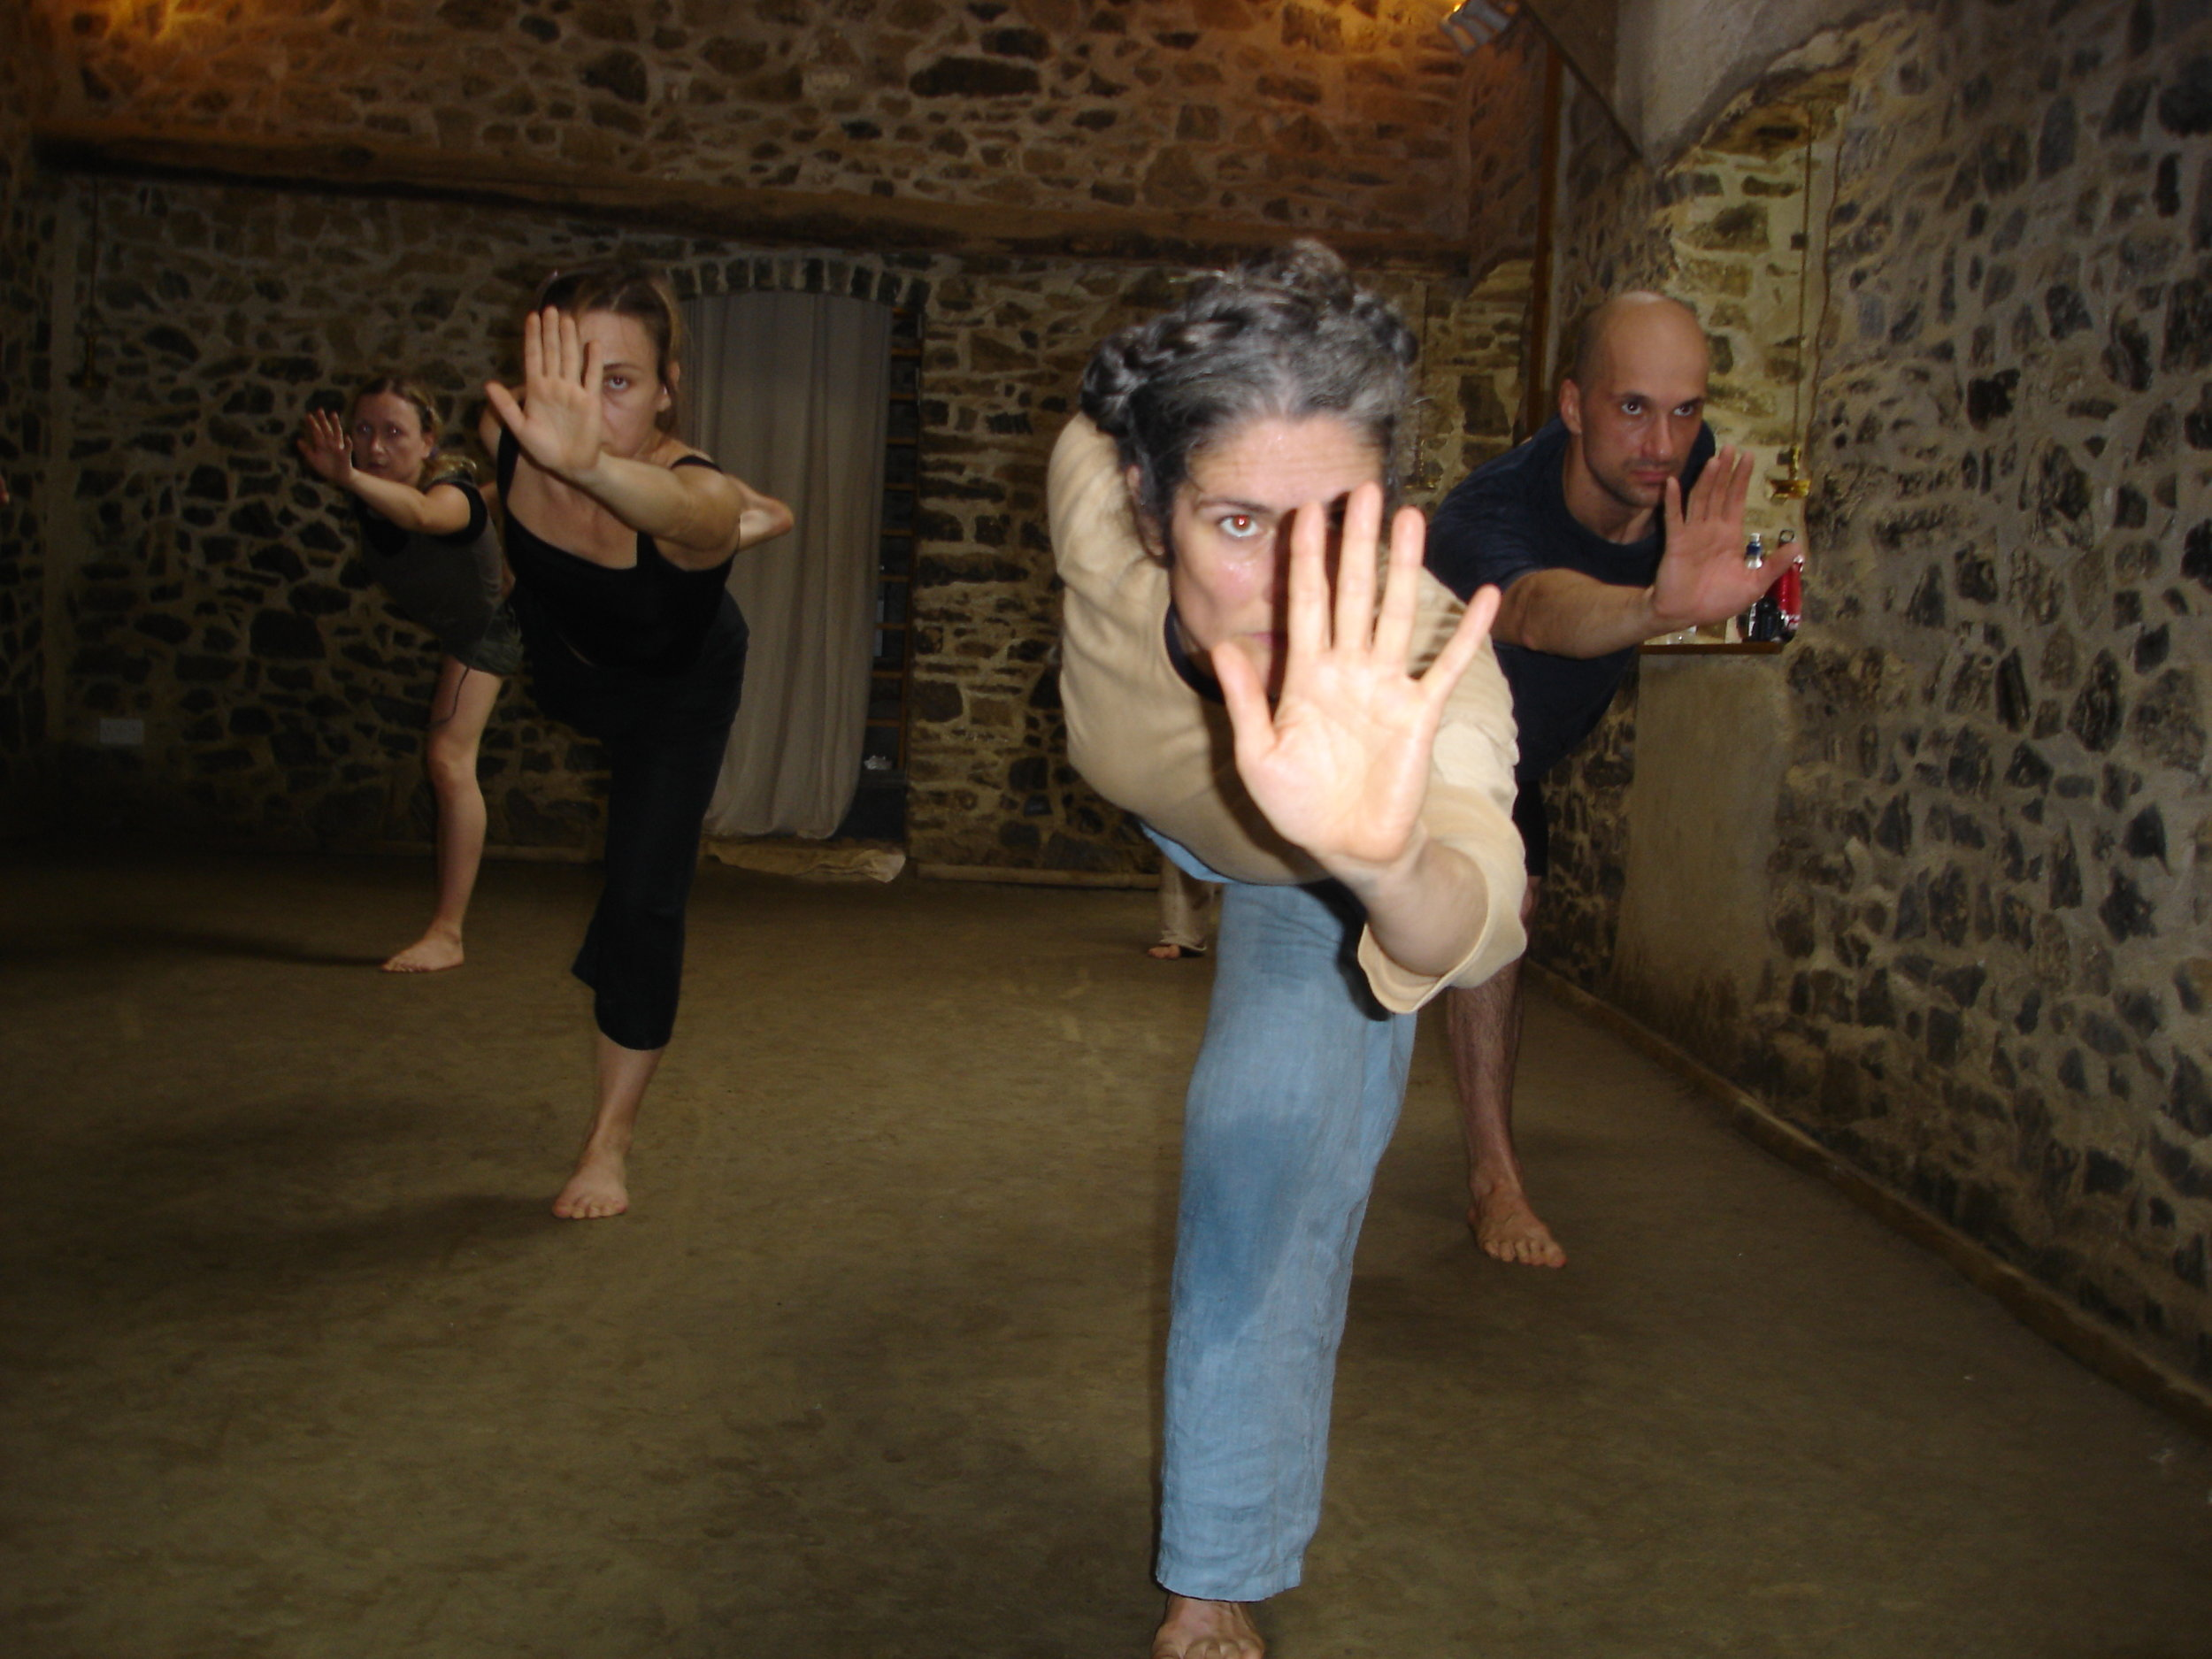 Pre-performative psychophysical training at the Tyn y parc CVN Kalari/Studio in West Wales.